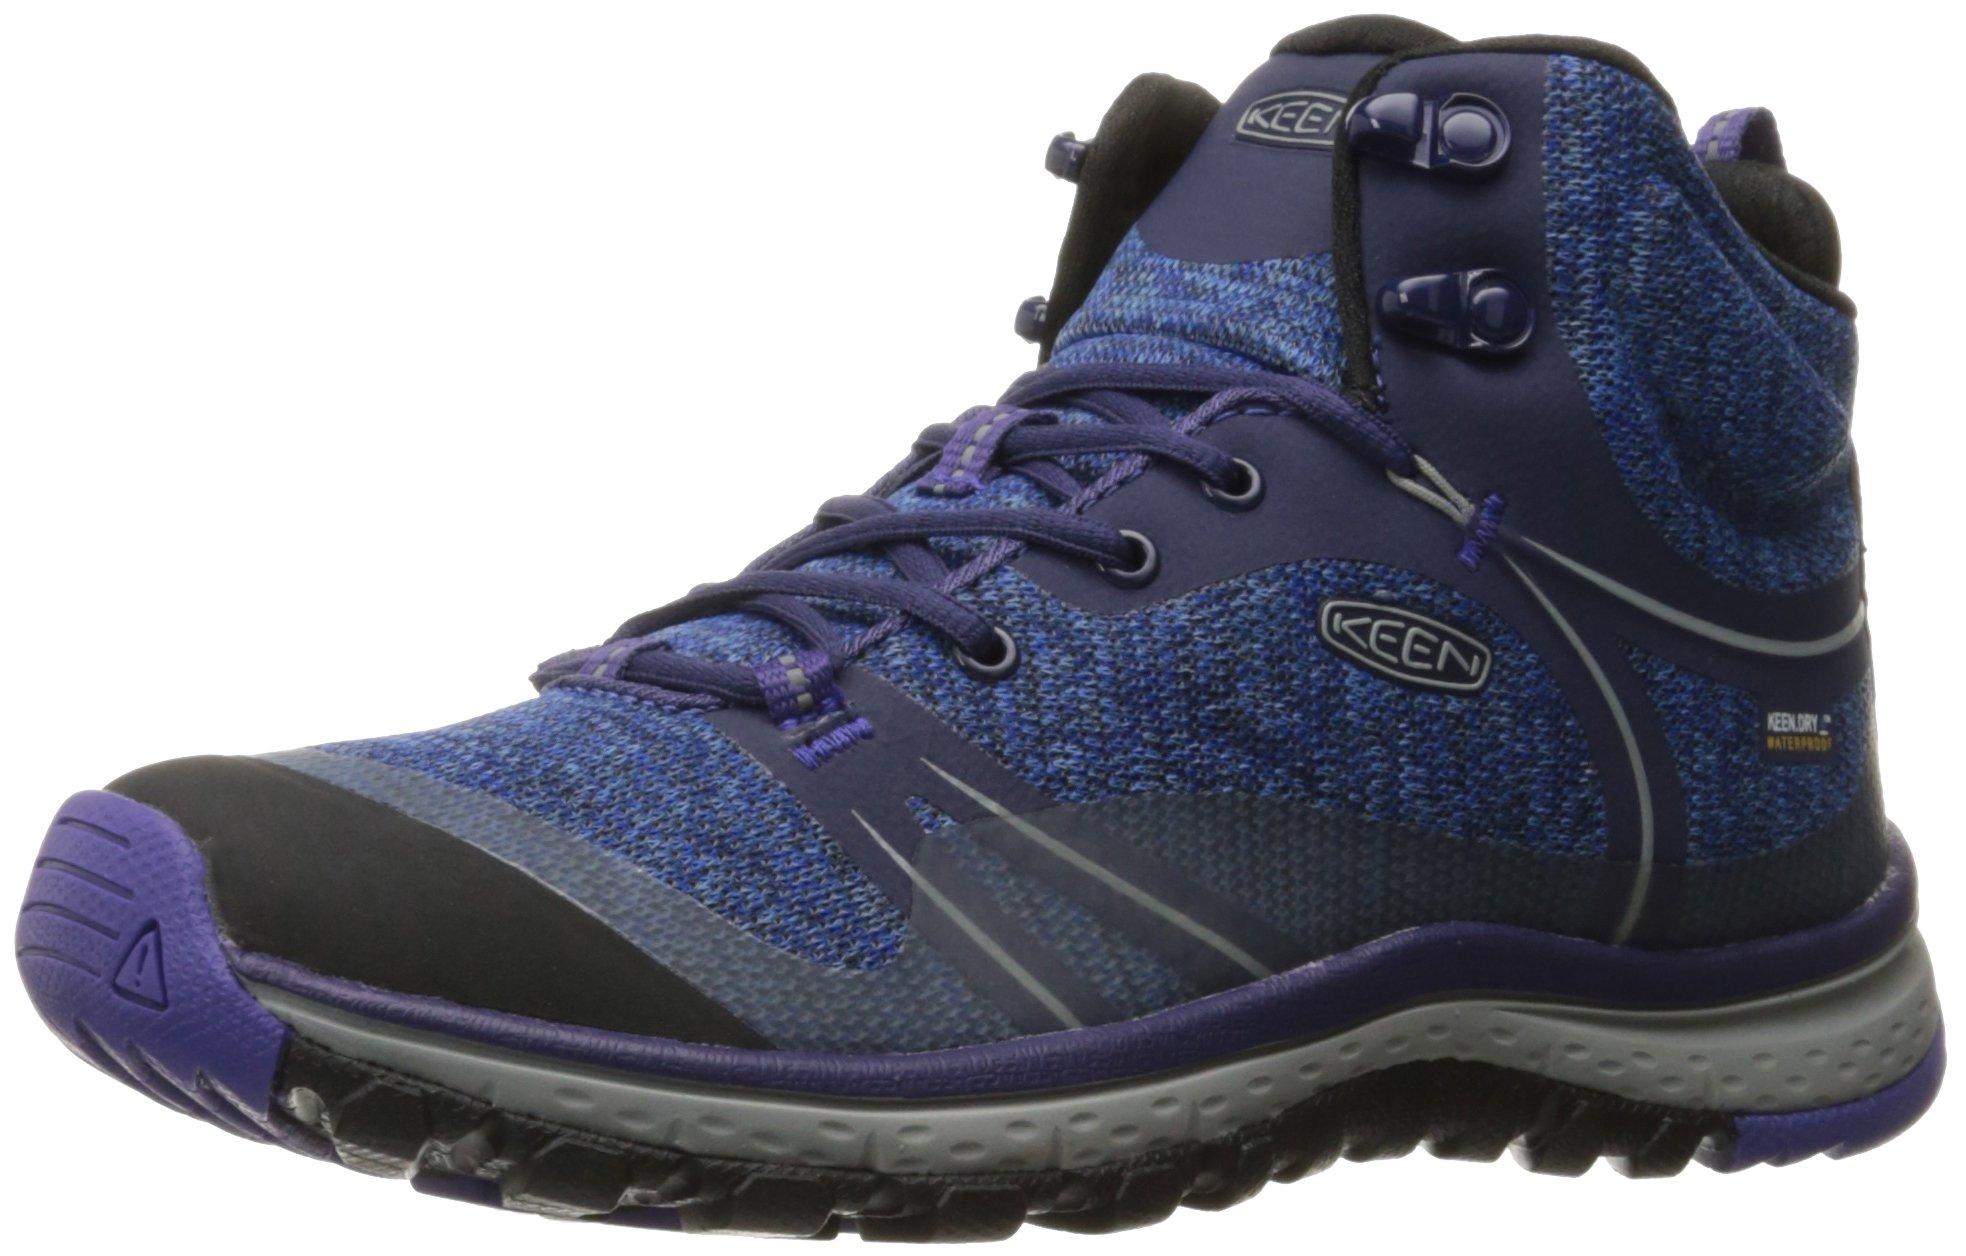 KEEN Women's Terradora Mid Waterproof Hiking Shoe, Astral Aura/Liberty, 6.5 M US